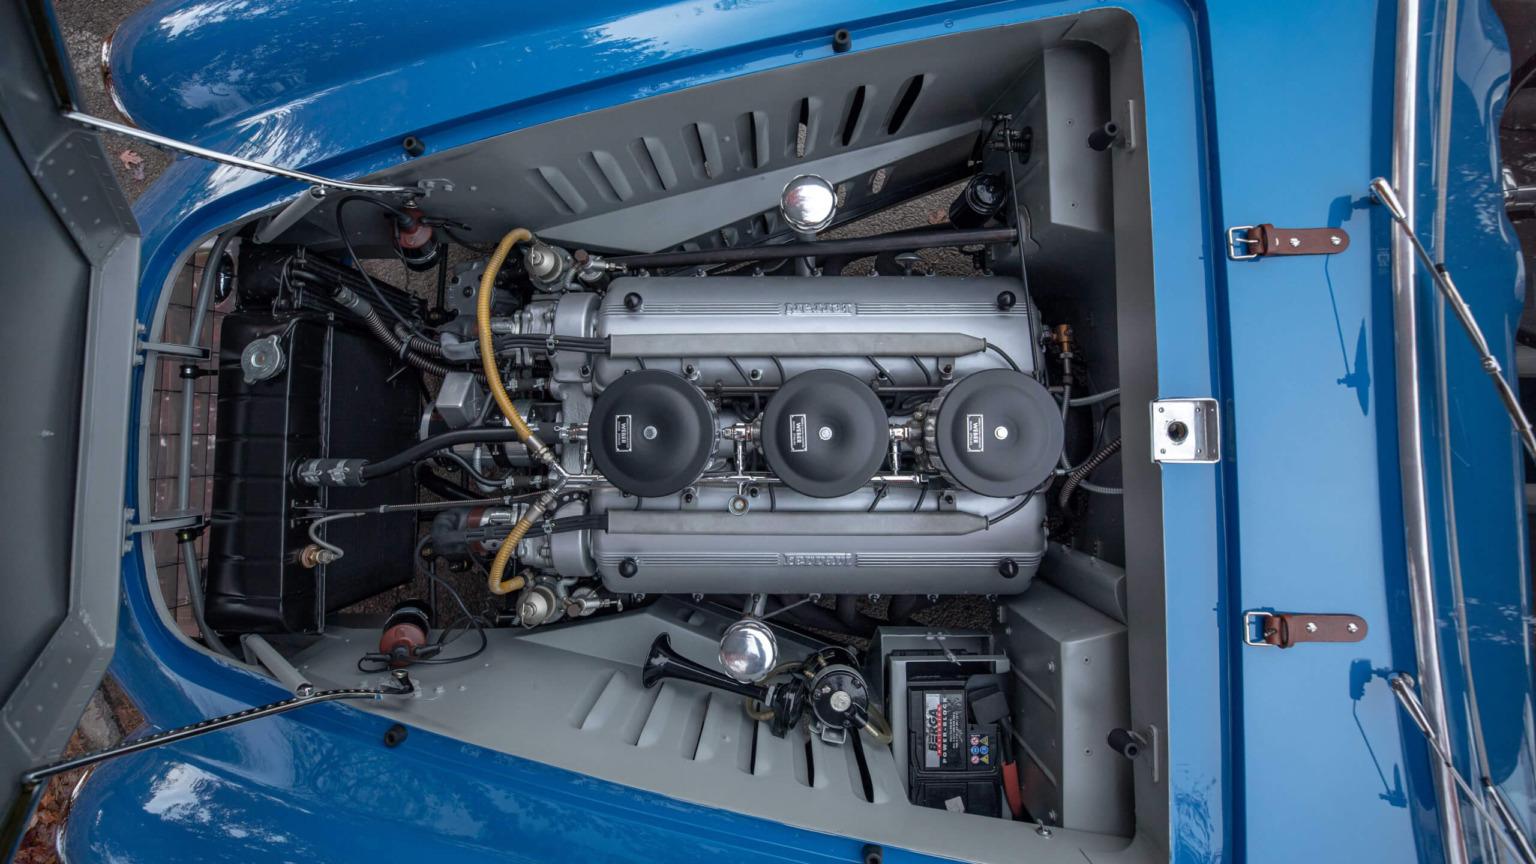 Petrolhead Corner History Ferrari 340 America 0202a 10 1536x864 Jpg Watchlounge